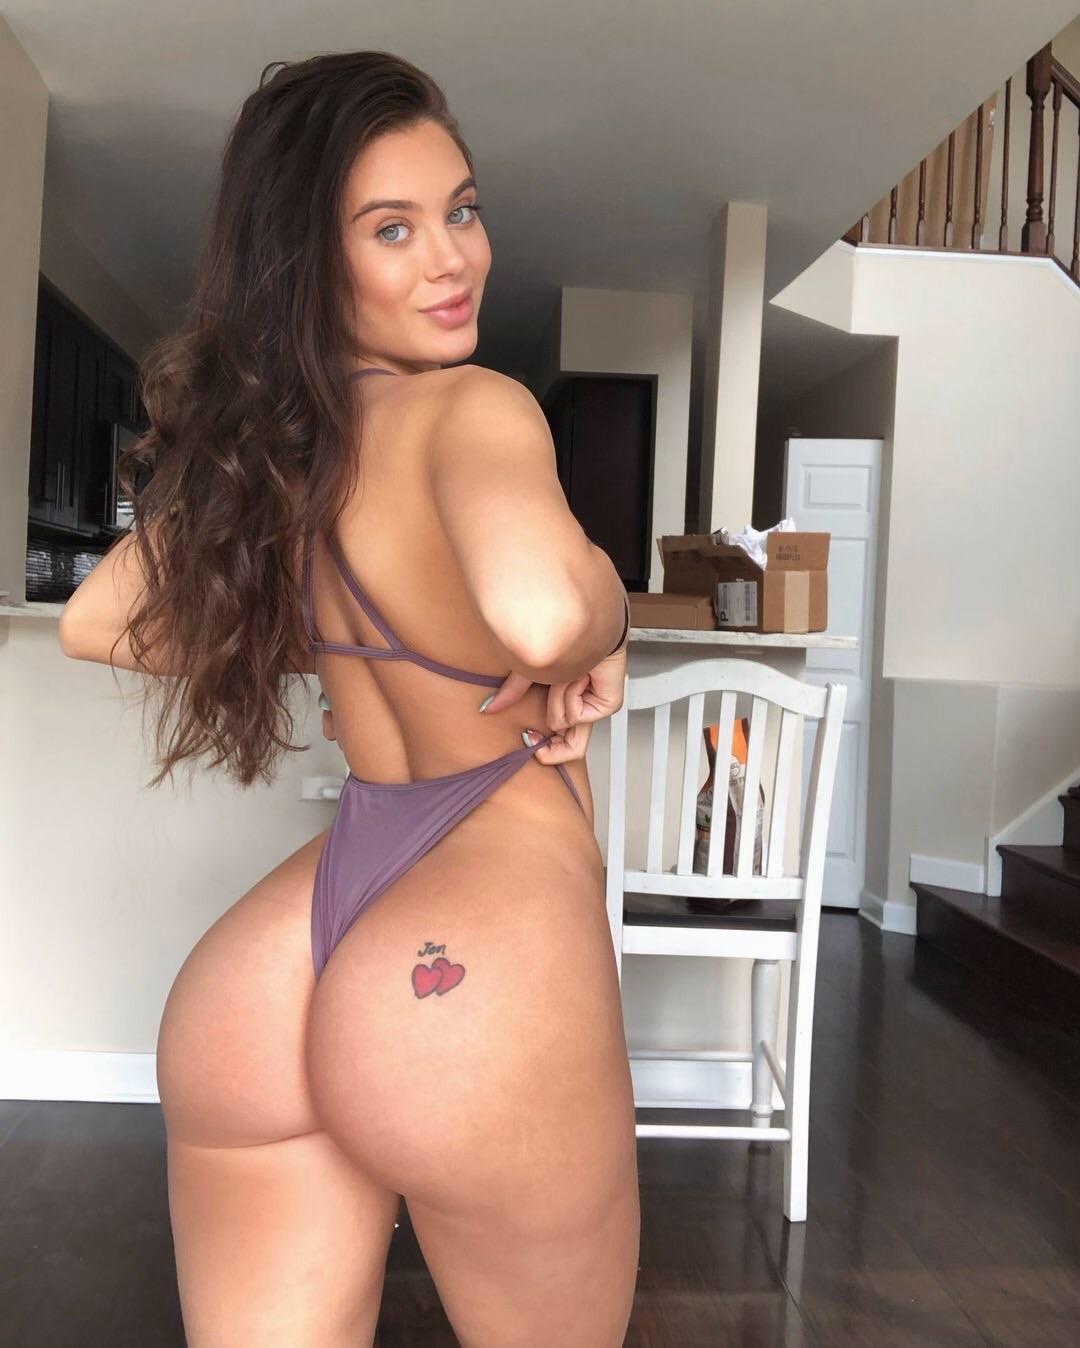 Lana Rhoades onlyfans super hot booty - Lana Rhoades OnlyFans Nude Porn Videos